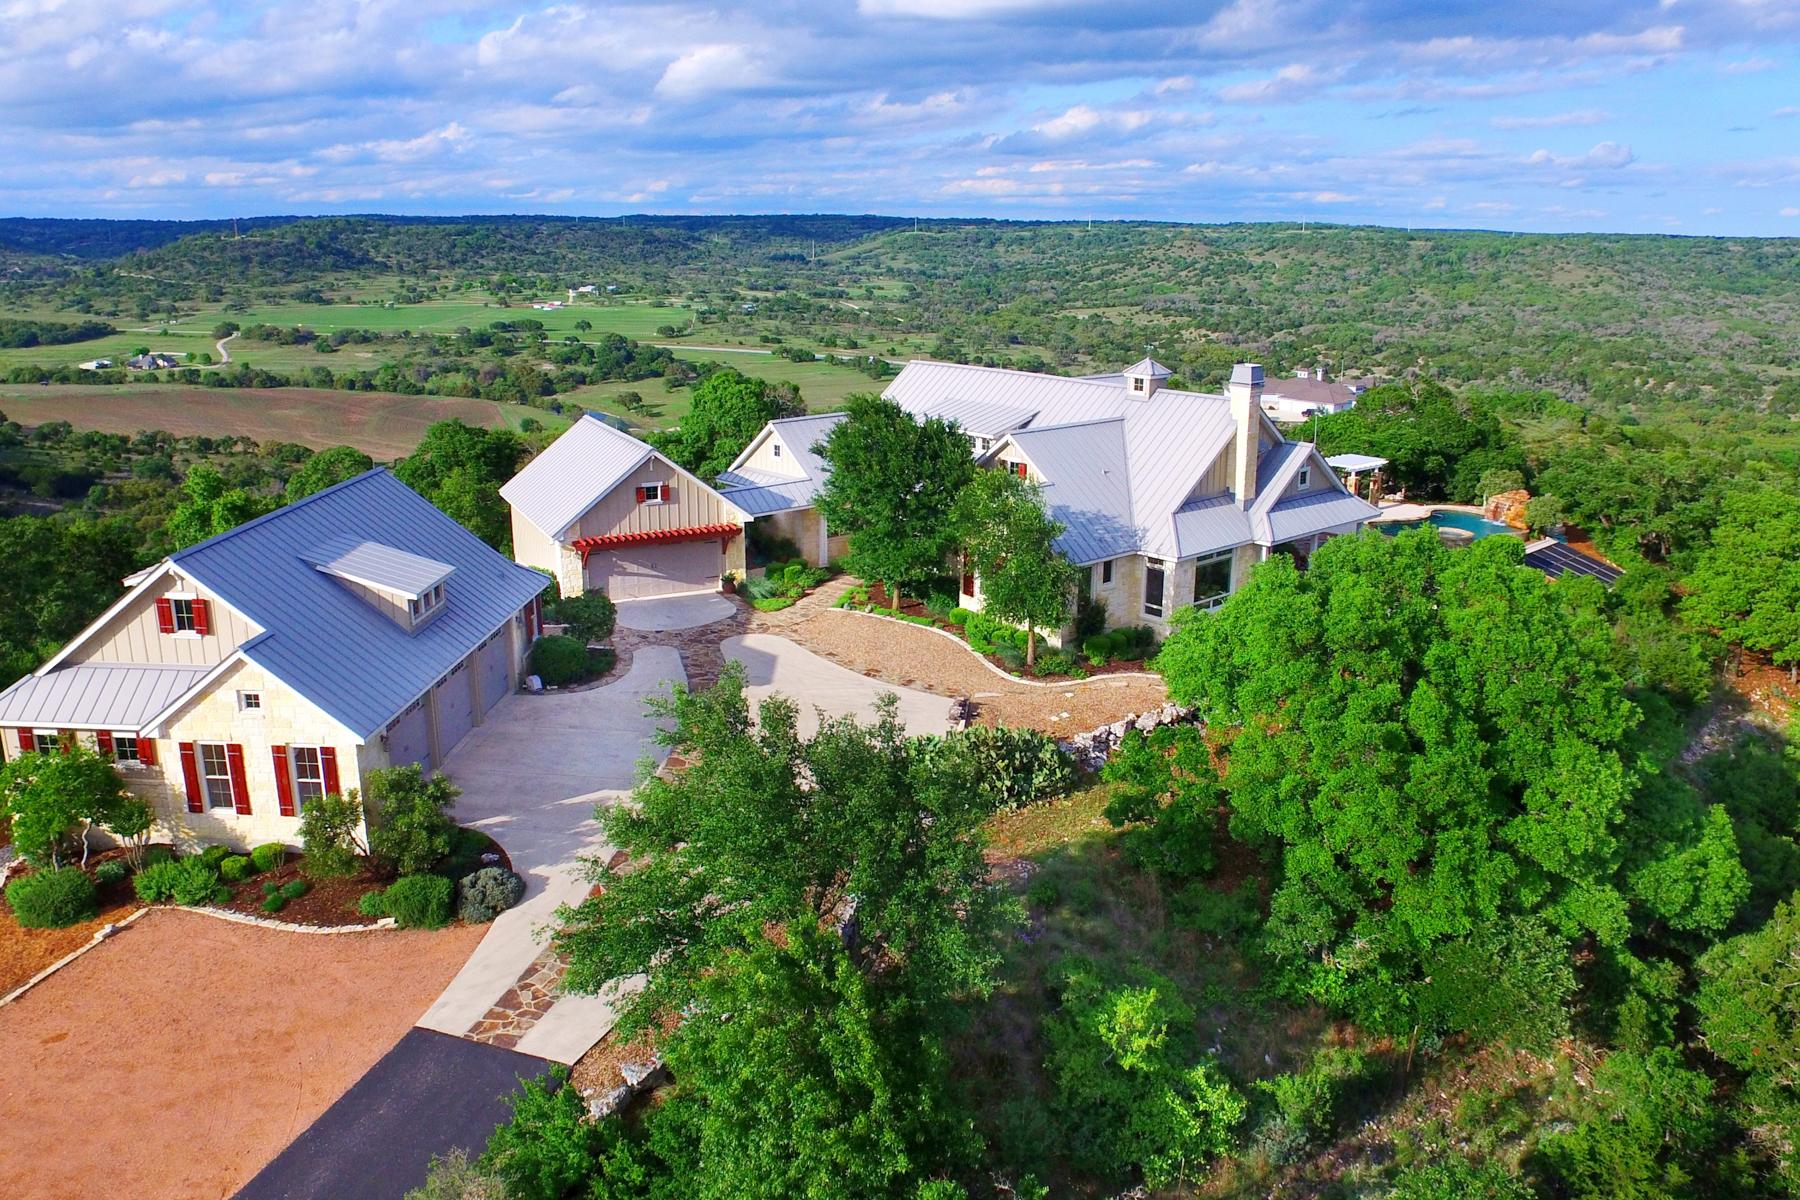 Casa Unifamiliar por un Venta en Panoramic Views From This Gorgeous Comfort Estate 174 Camino Del Reserve Ln Comfort, Texas 78013 Estados Unidos